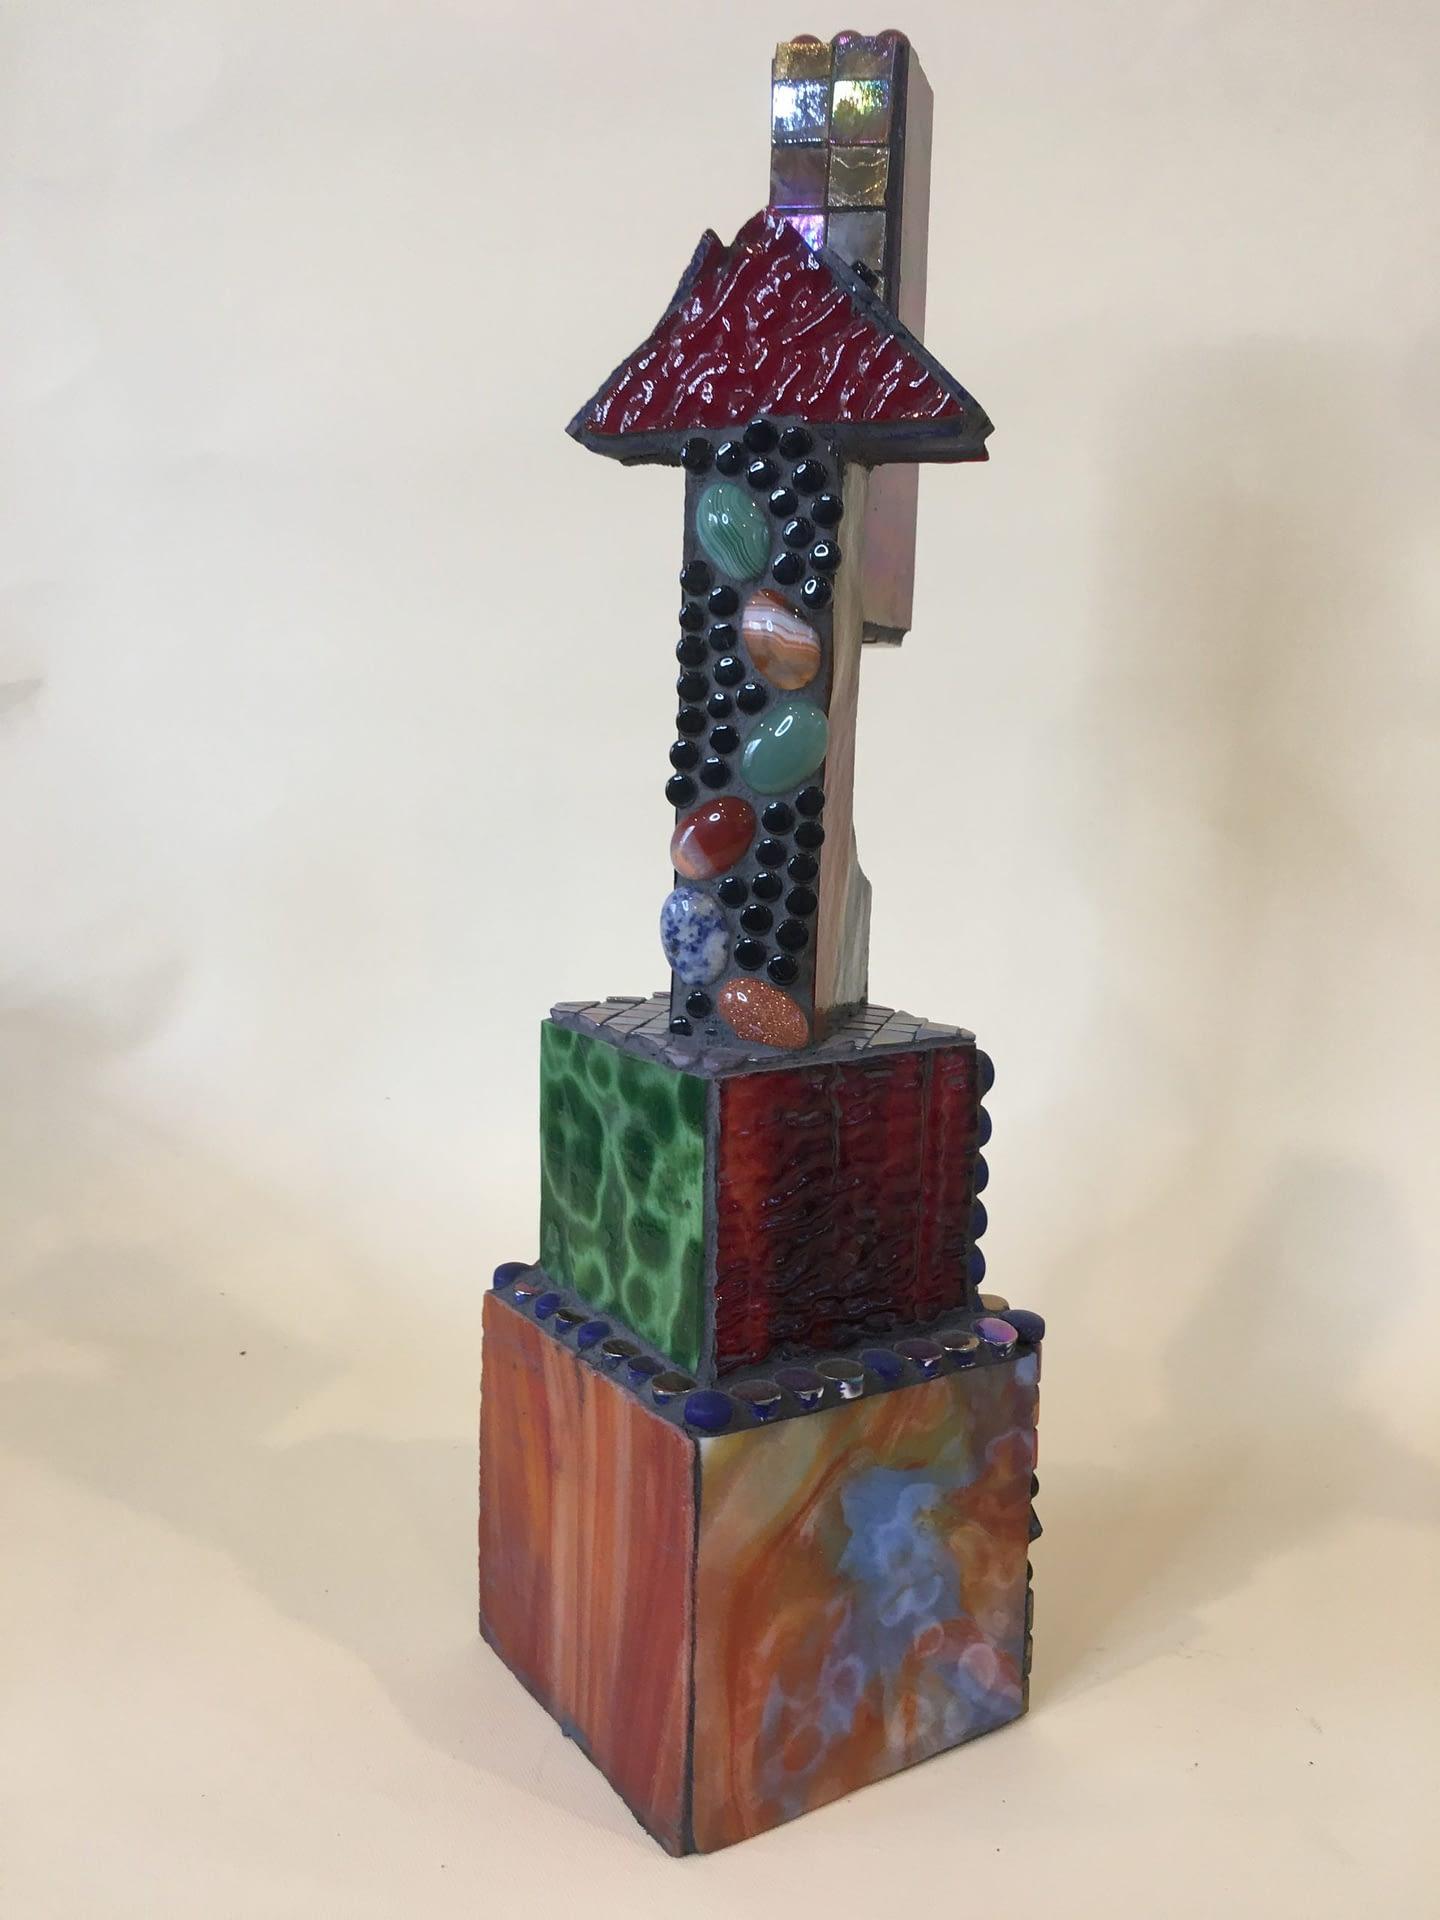 Glass Mosaic over wood sculpture No. 8